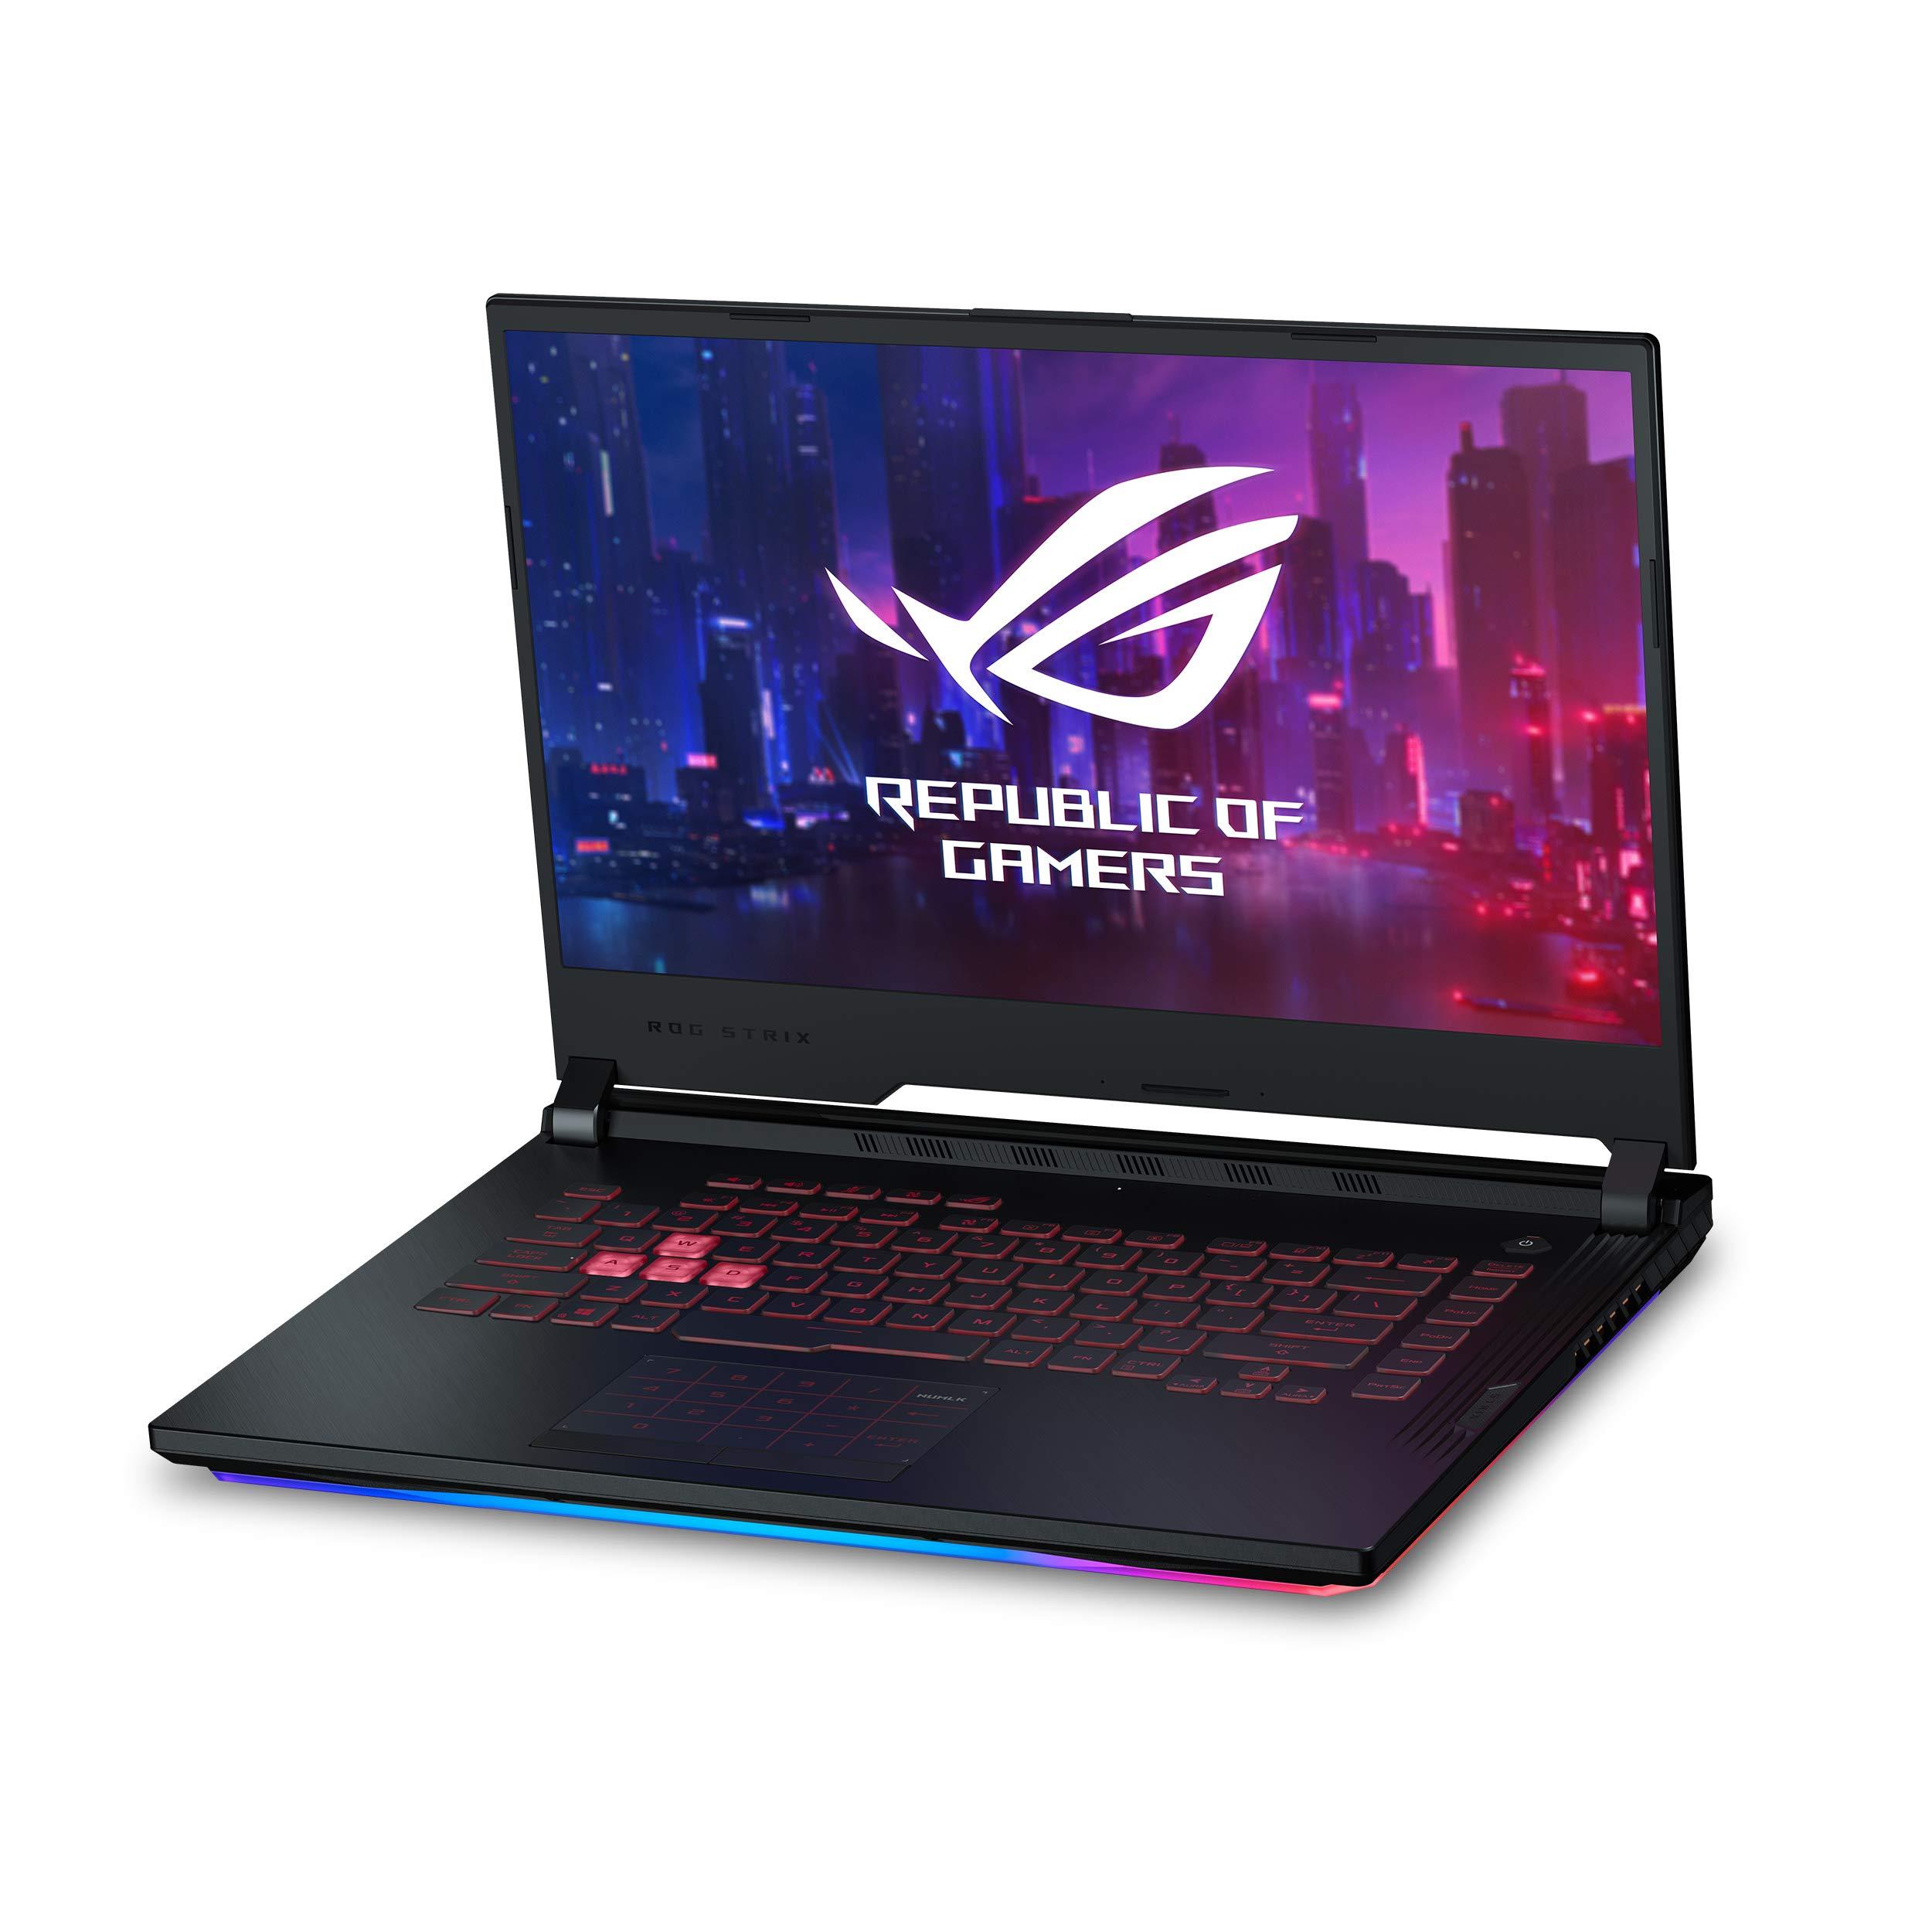 "Asus ROG Strix G Gaming Laptop, 15.6"" 120Hz IPS Type Full HD, NVIDIA GeForce RTX 2060, Intel Core i7-9750H, 16GB DDR4, 512GB PCIe Nvme SSD, RGB KB, Windows 10, GL531GV-PB74"